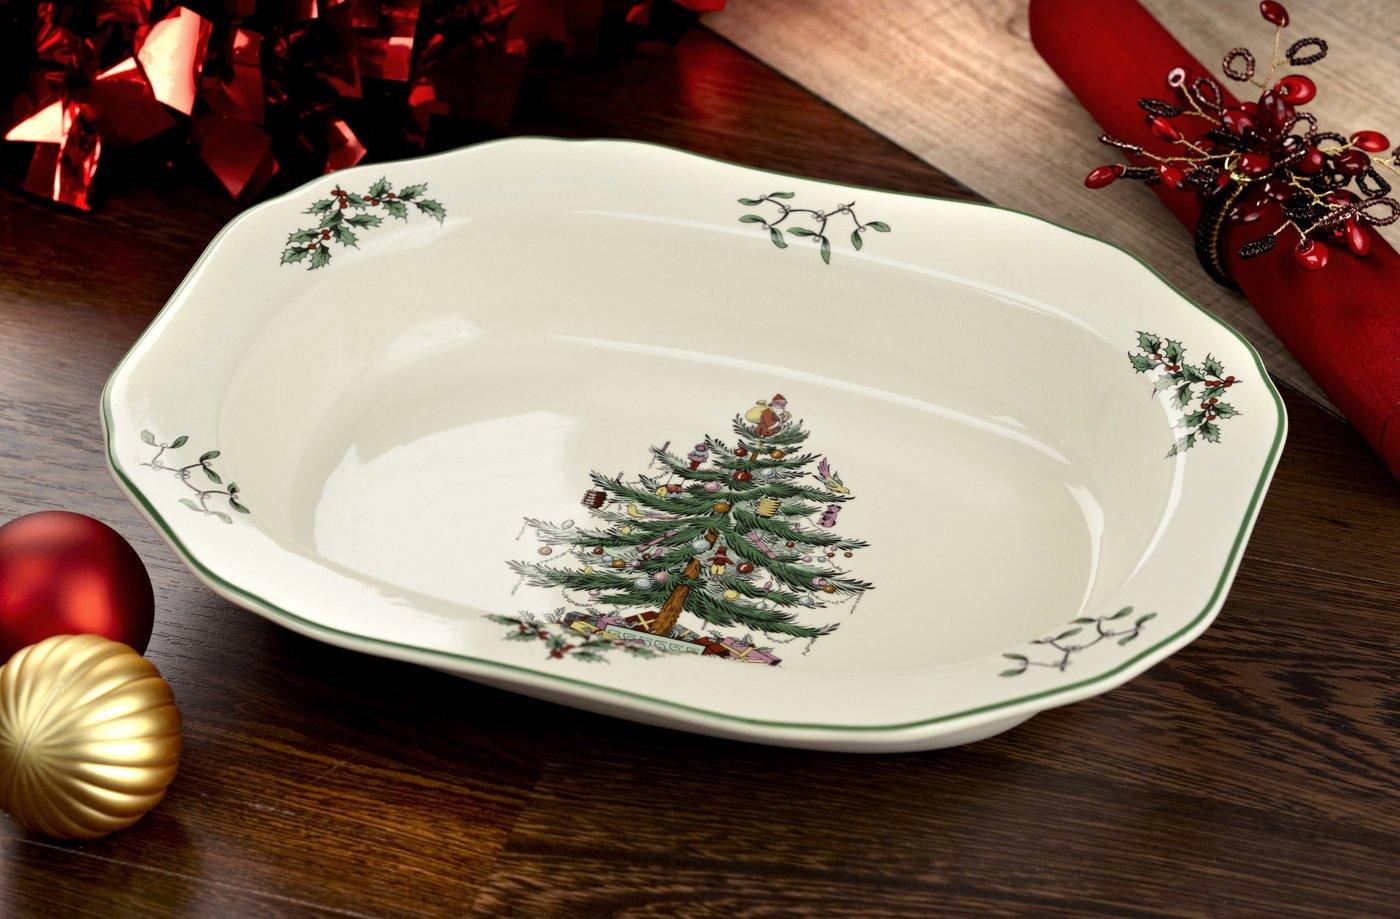 Amazon.com: Spode Christmas Tree Open Vegetable Dish, 1 11-1/2-Inch ...